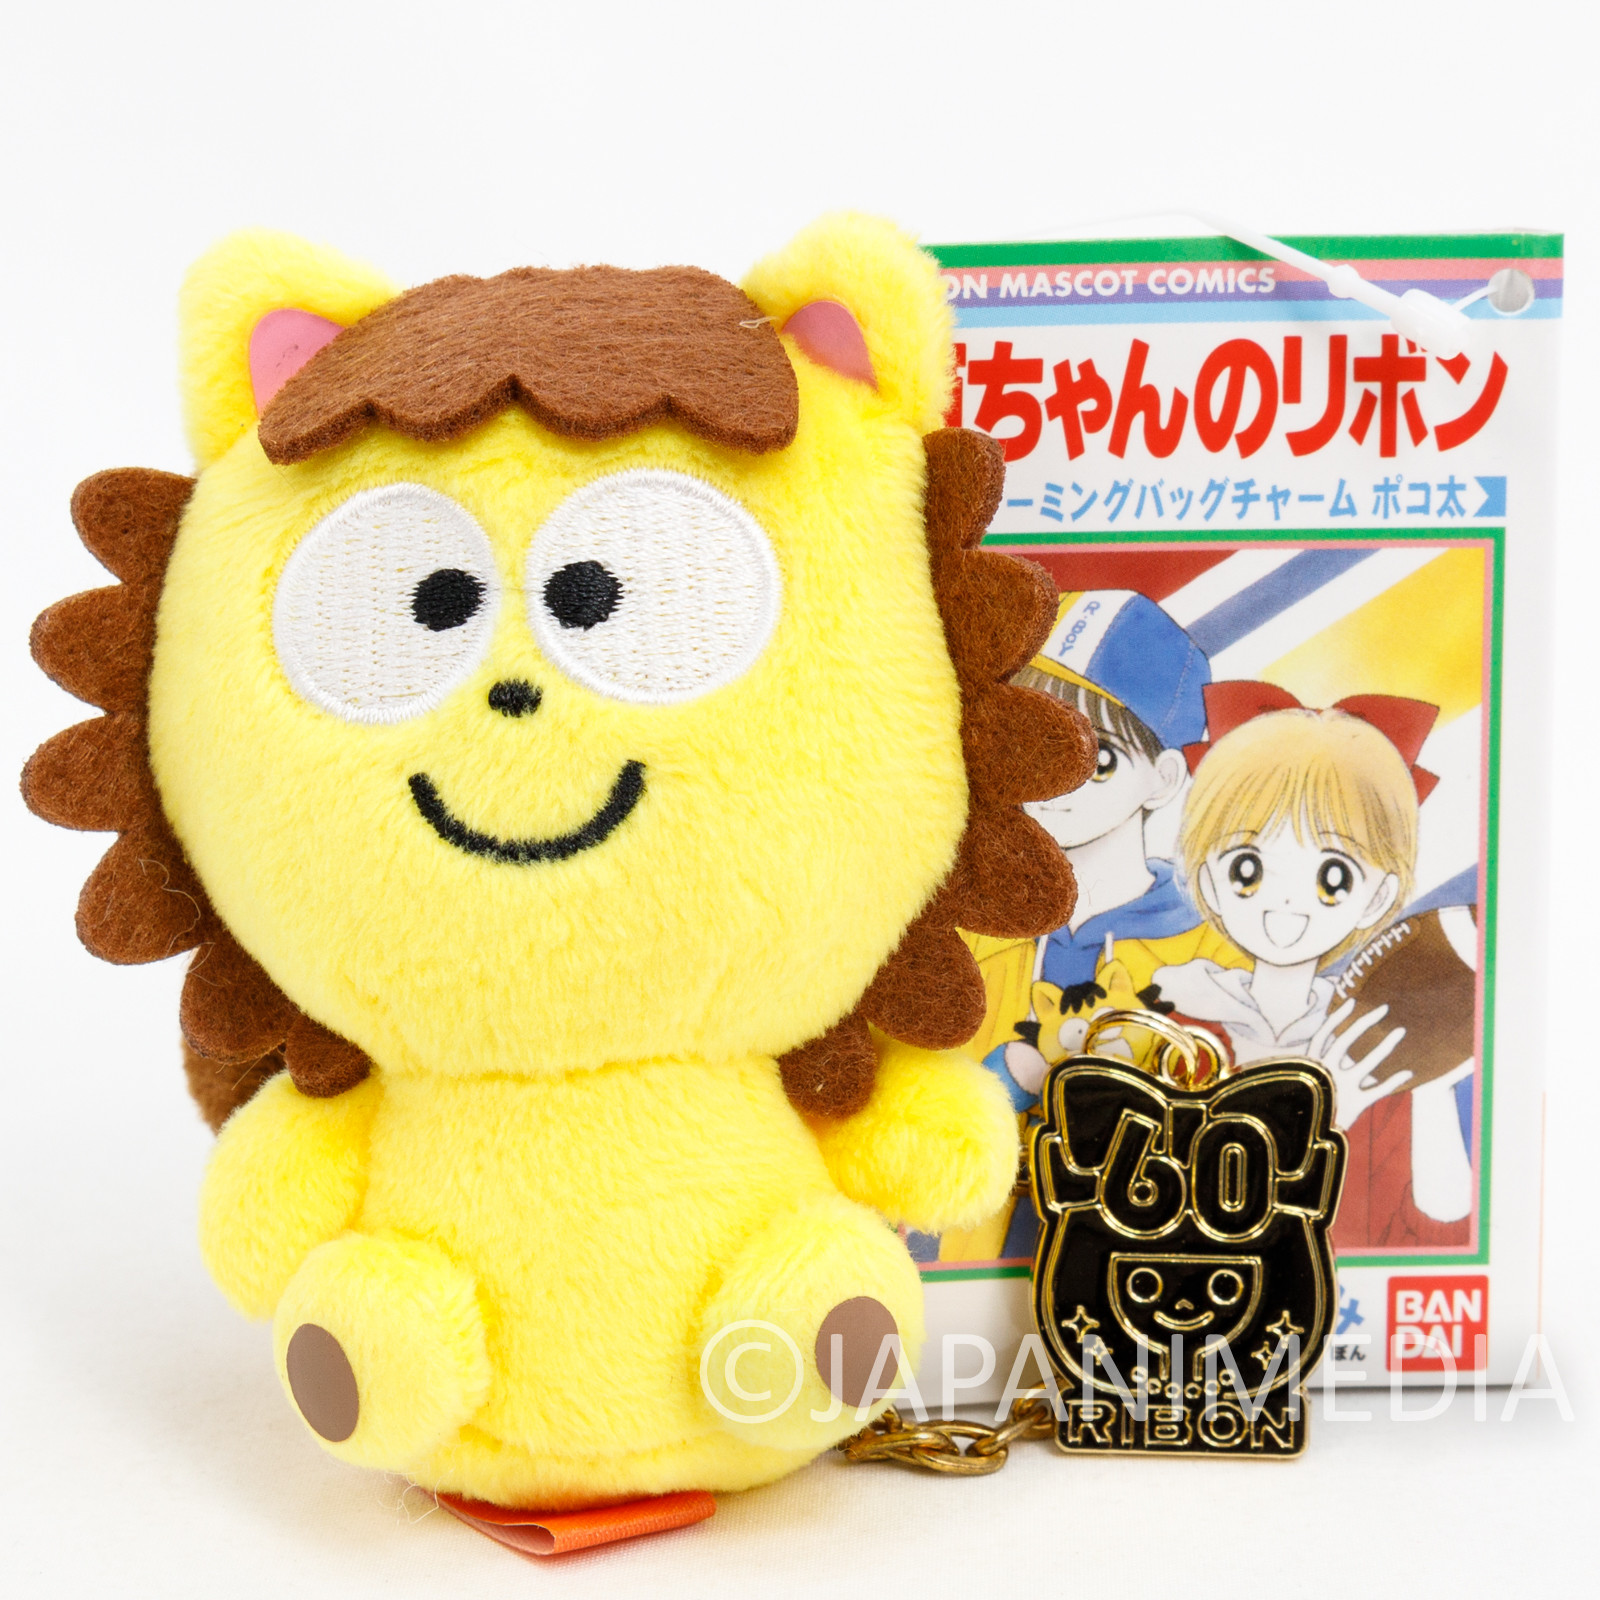 Hime-chan's Ribbon Pokota Mini Plush Doll w/chain Ribon Magazine JAPAN ANIME